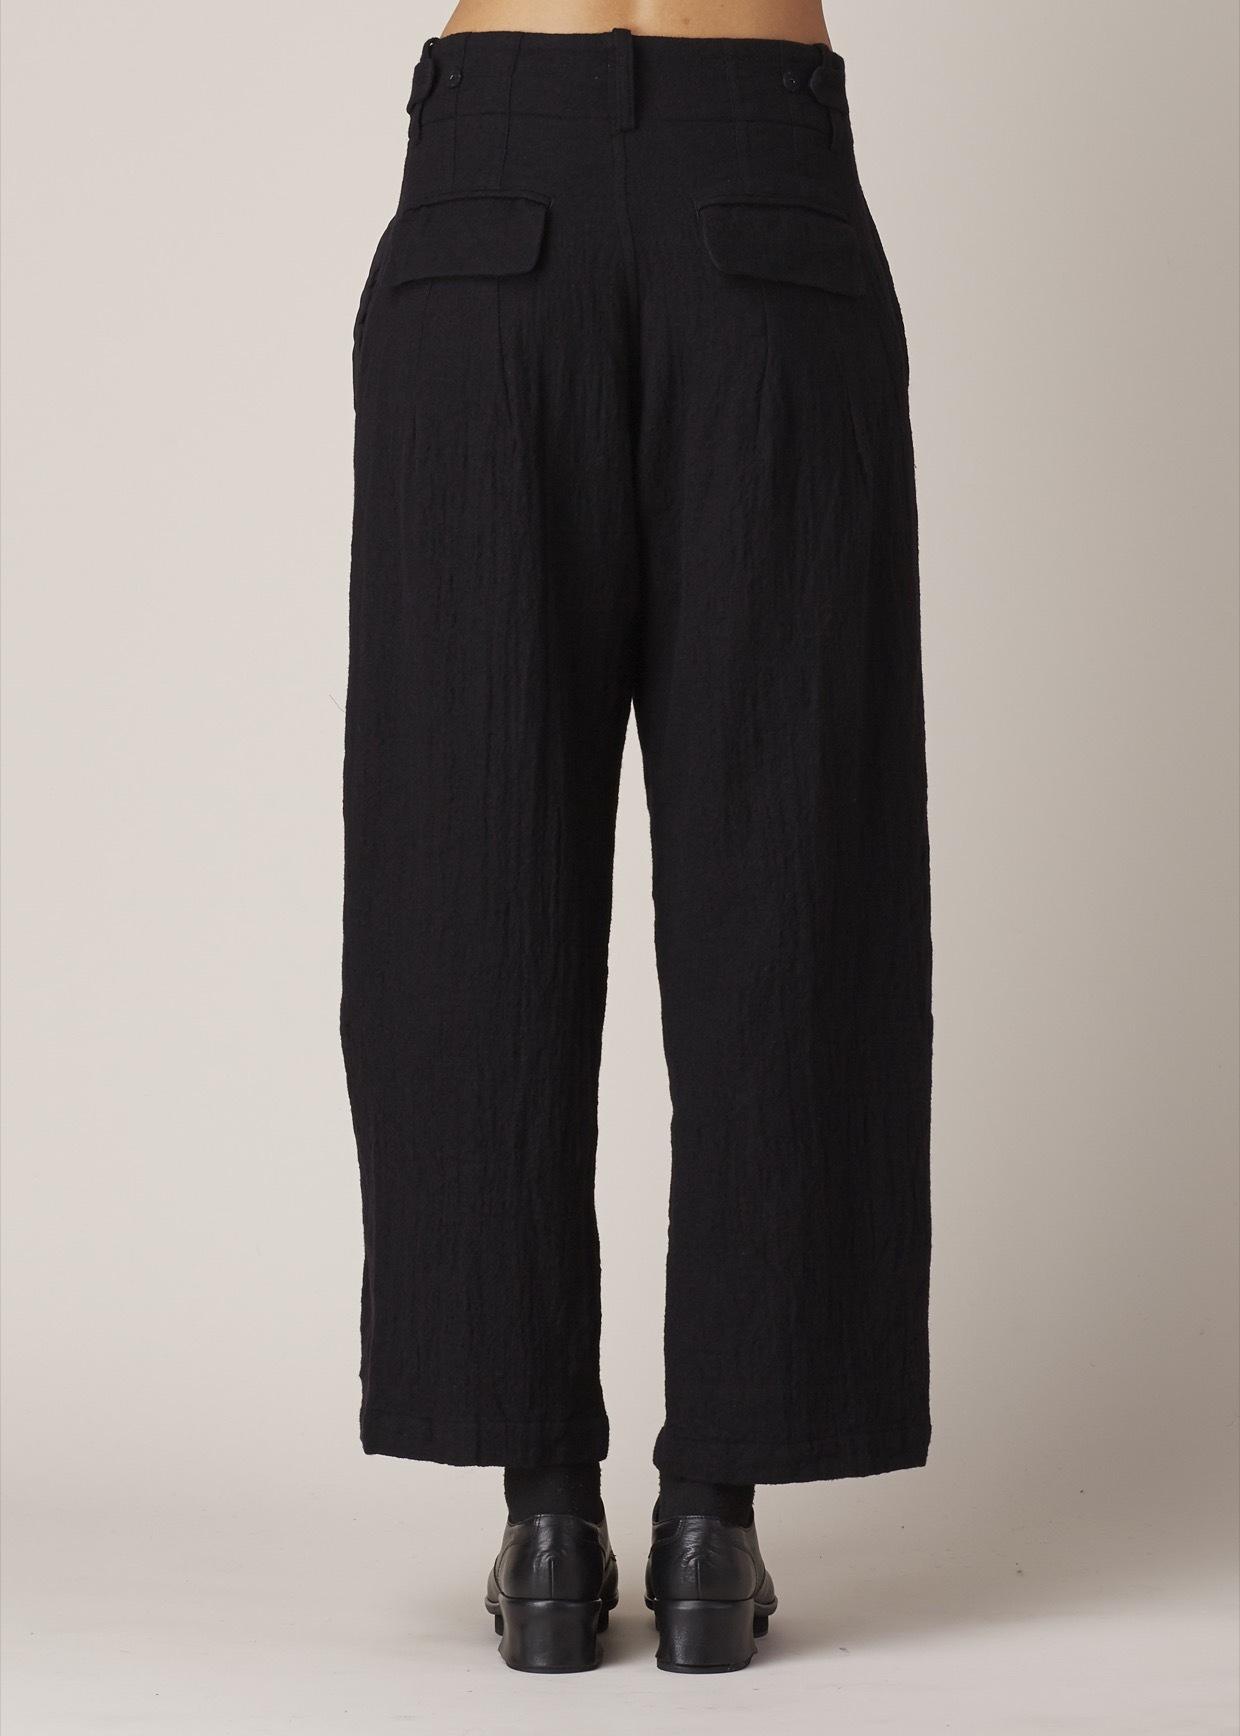 wide-leg joggers - Black Yohji Yamamoto p0ZfeAarb